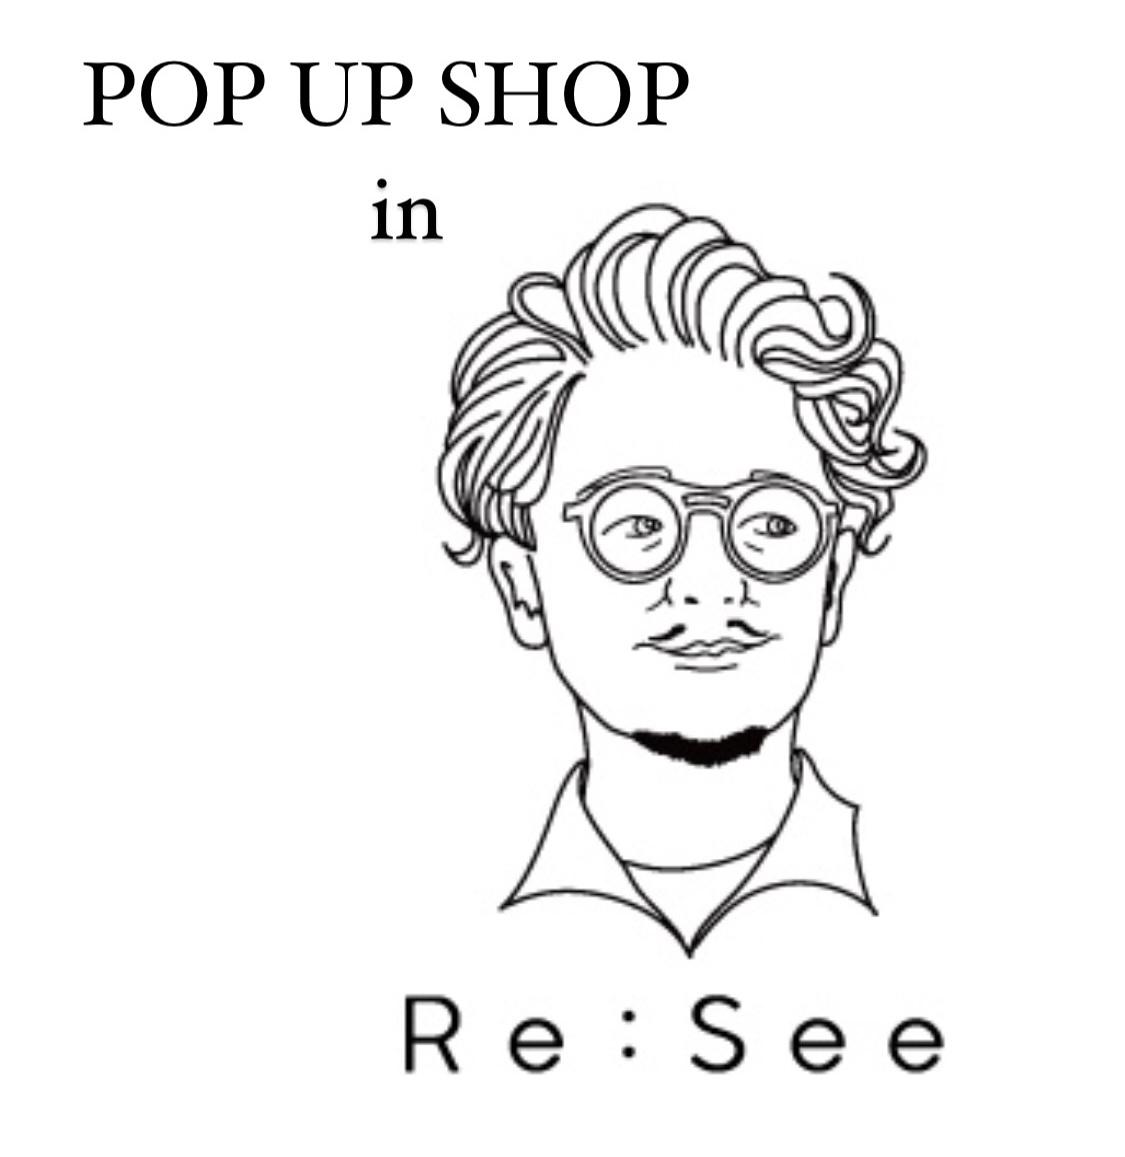 3月19日(金)・20日(土)・21日(日) 3日間限定!POPUPSHOP IN 『Re:See』